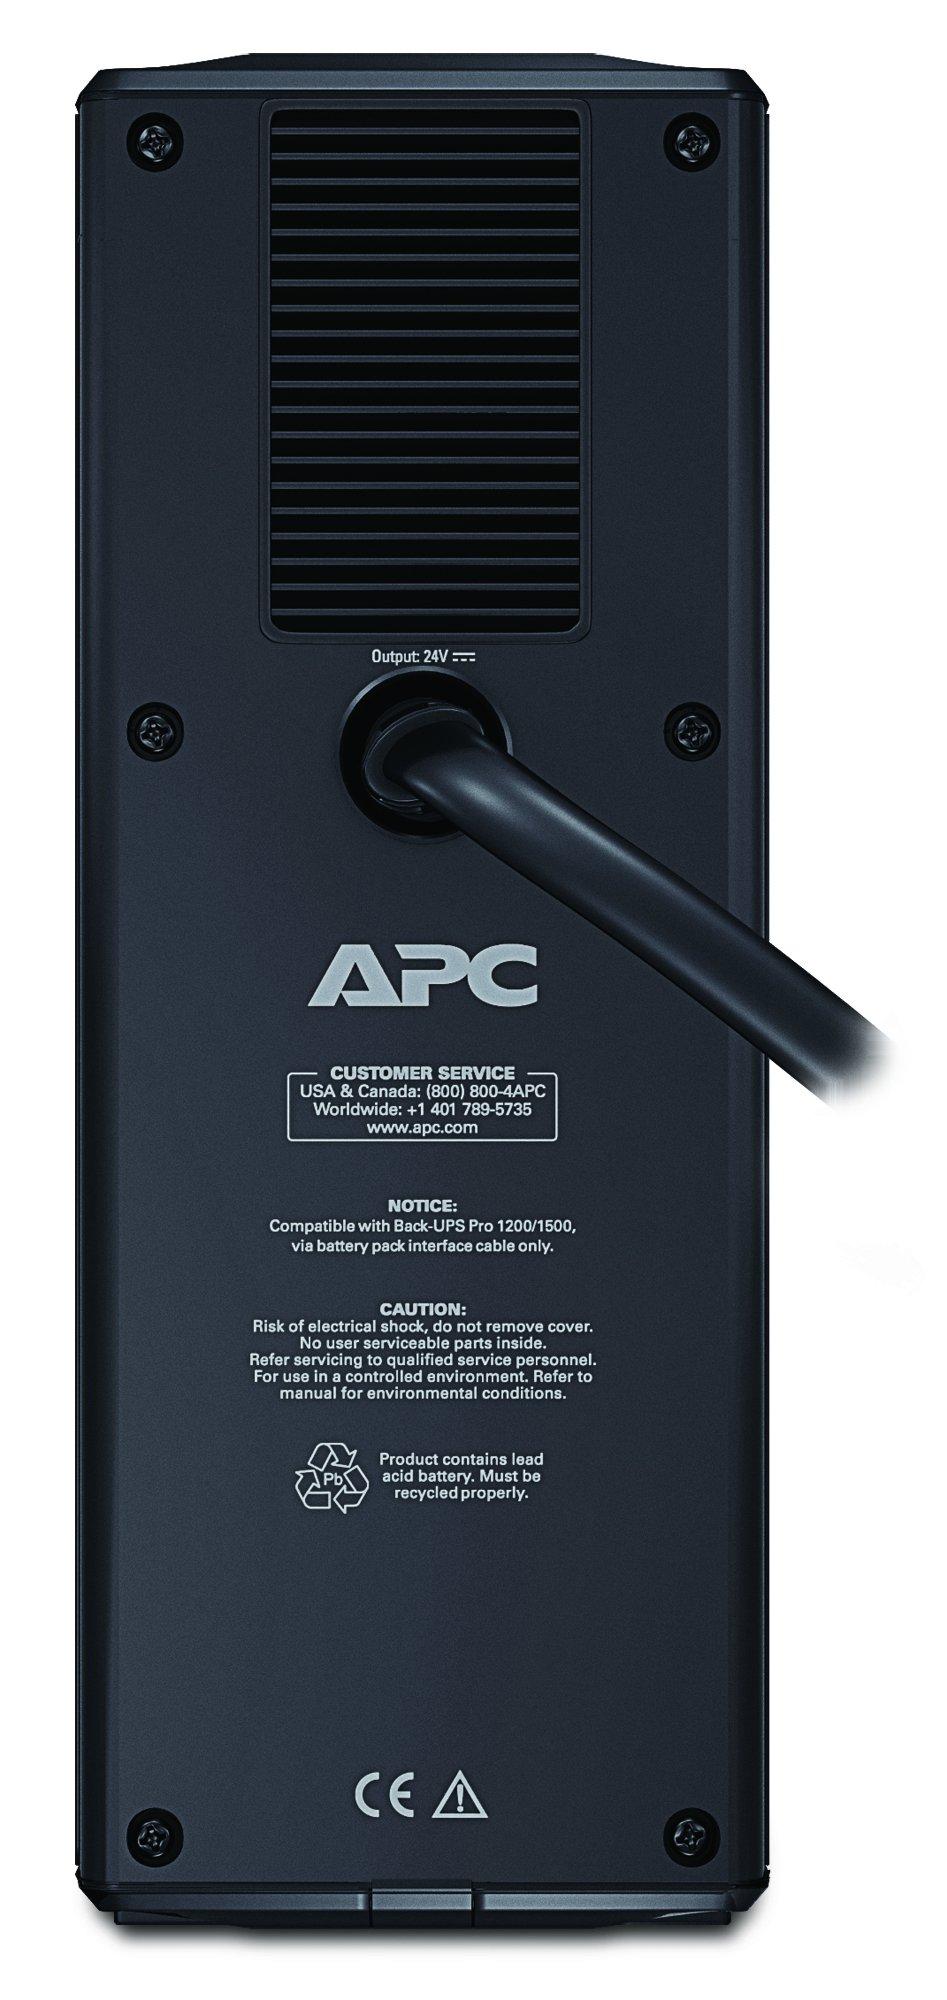 APC External Battery Backup Pack for Model BR1500G (BR24BPG) by APC (Image #2)